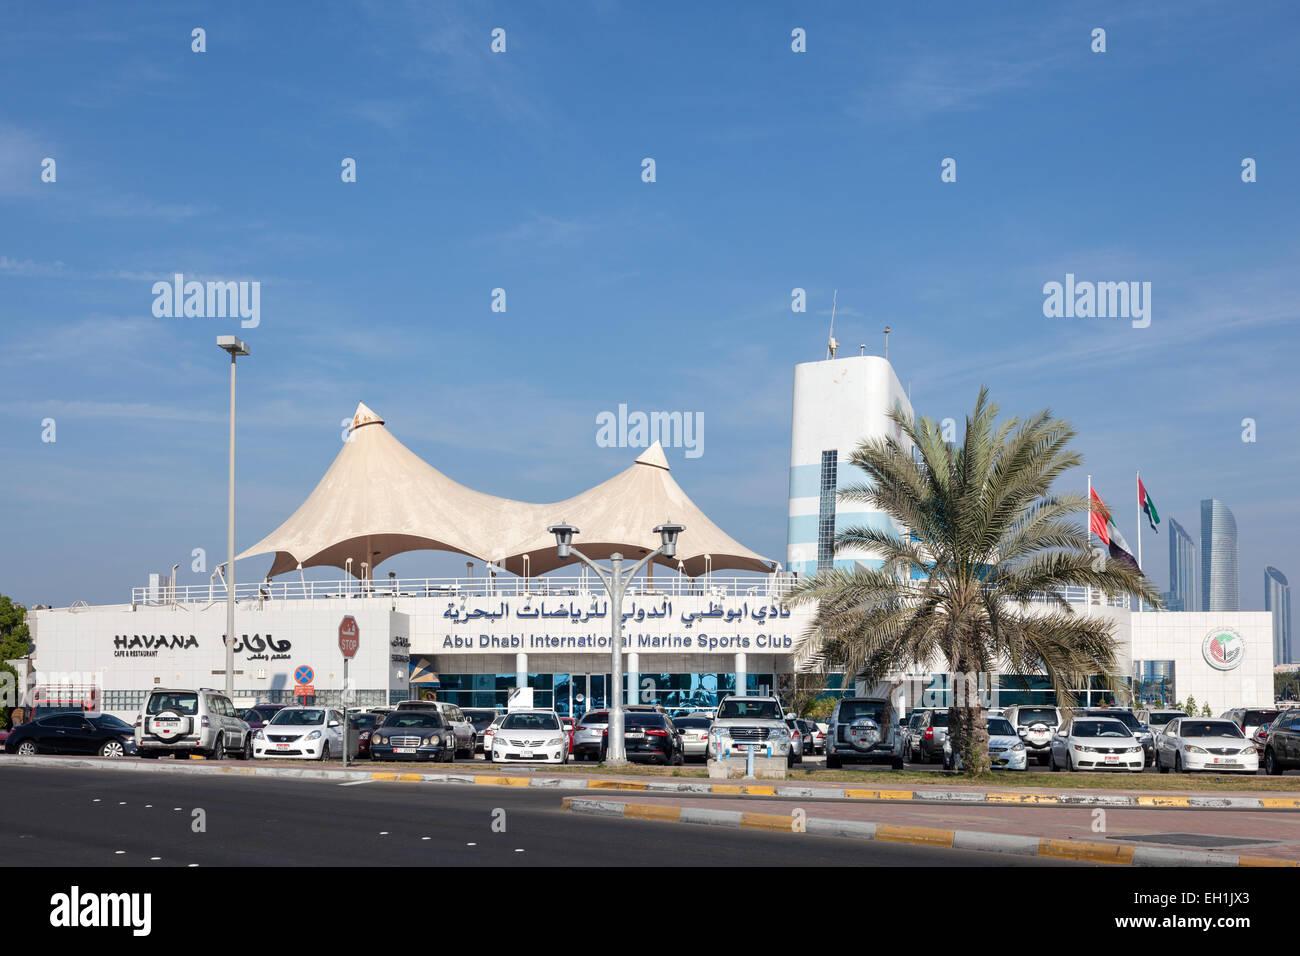 International Marine Sports Club in Abu Dhabi. December 21, 2014 in Abu Dhabi, United Arab Emirates - Stock Image